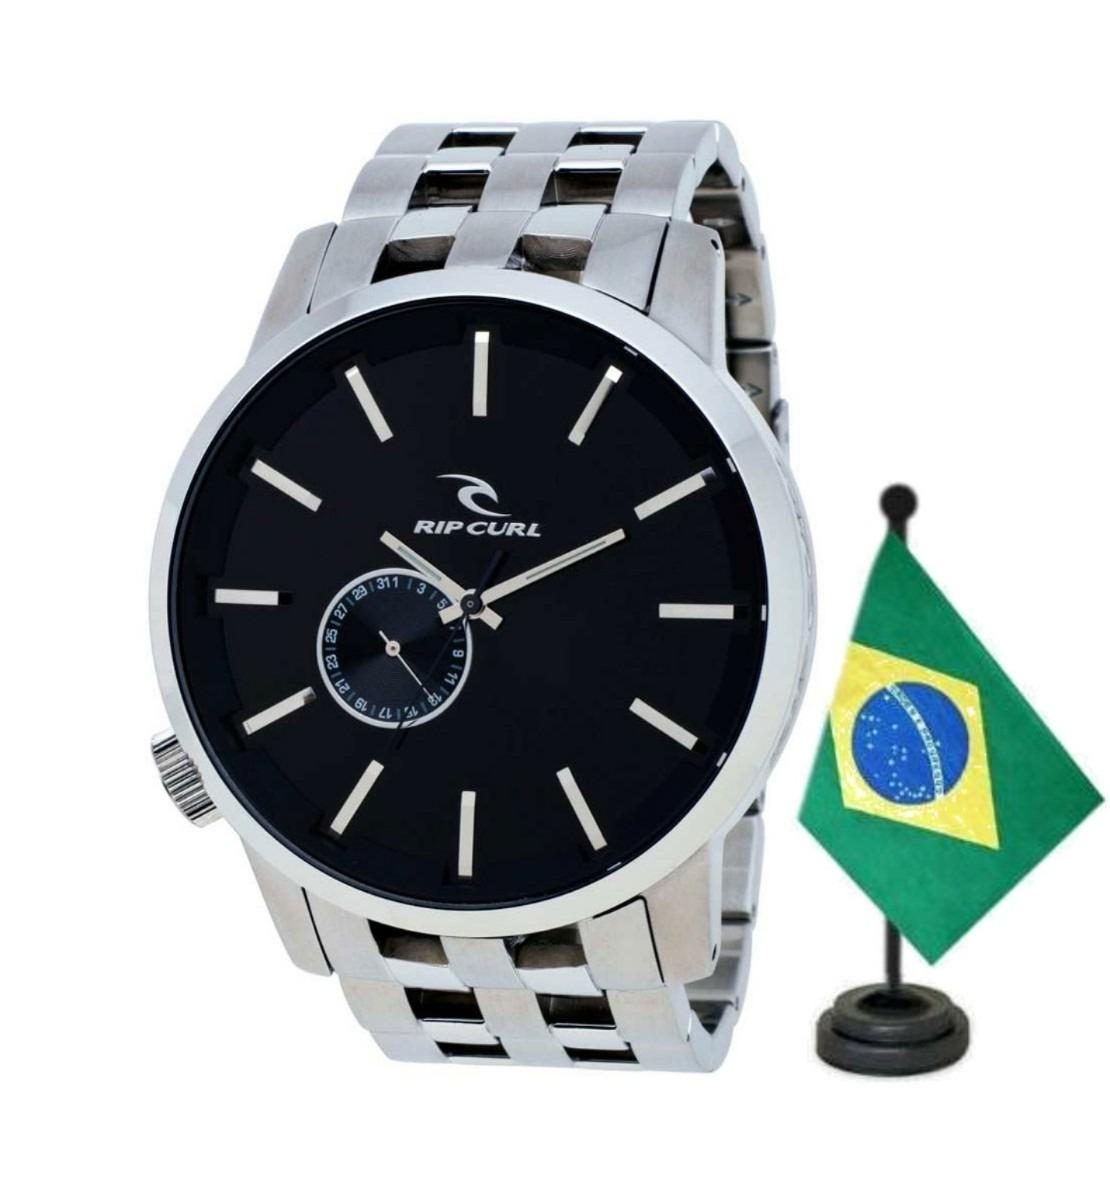 836f0c352e8 Relógio Rip Curl Detroit Steel Black Sss - Frete Grátis - R  1.399 ...